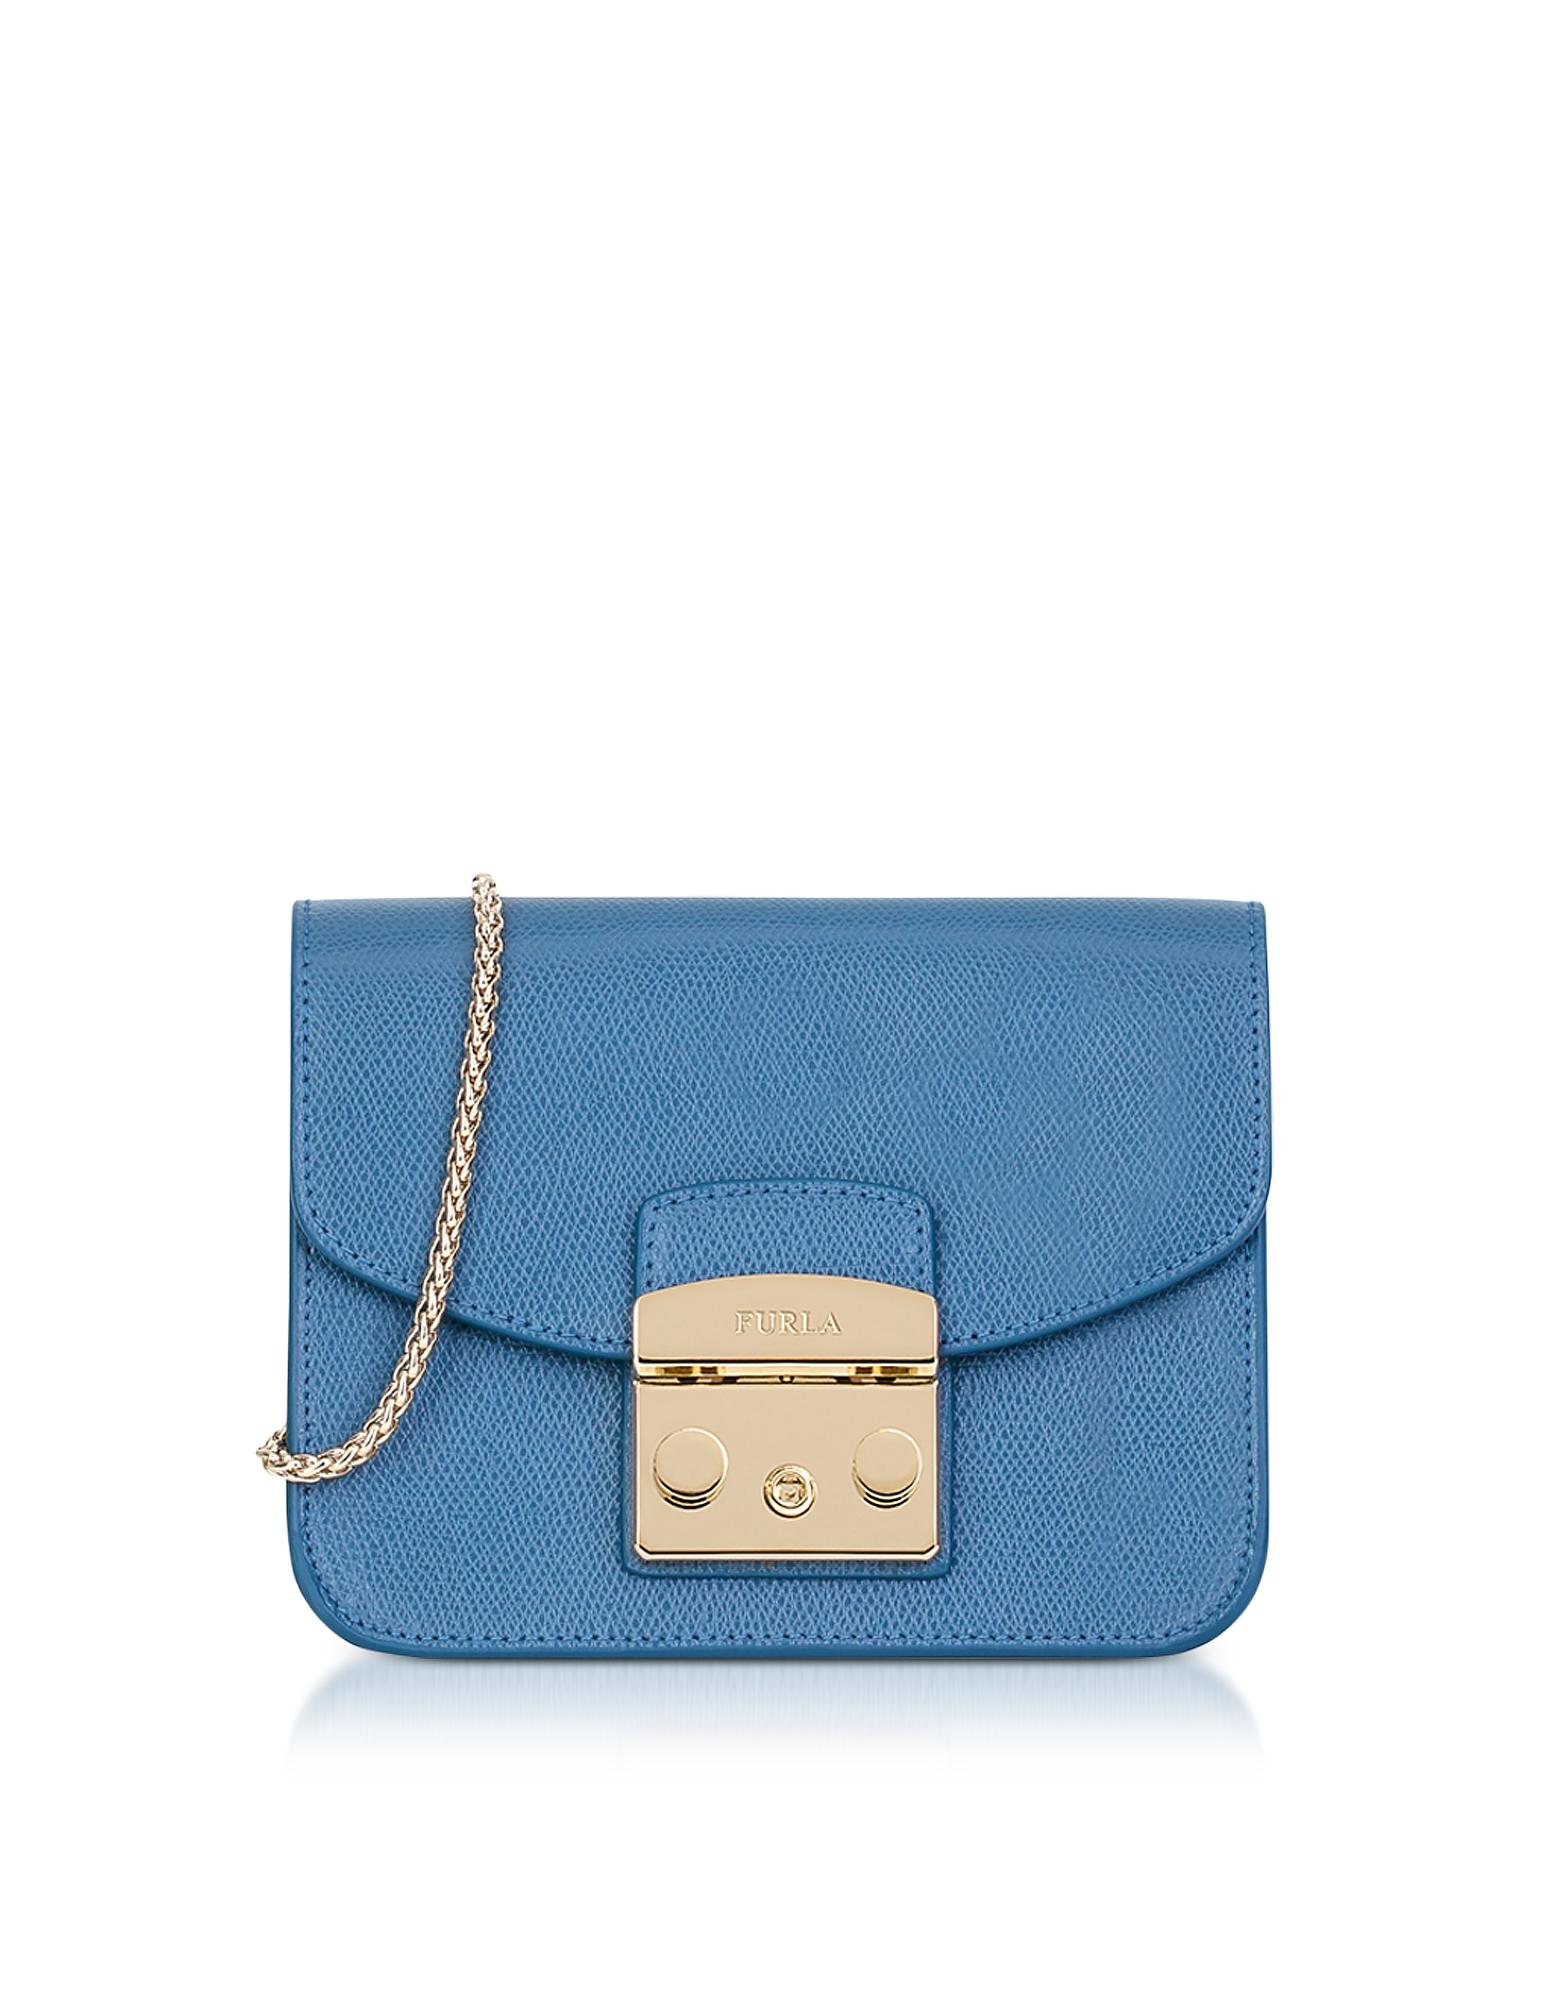 Furla Handbags, Celeste Leather Metropolis Mini Crossbody Bag